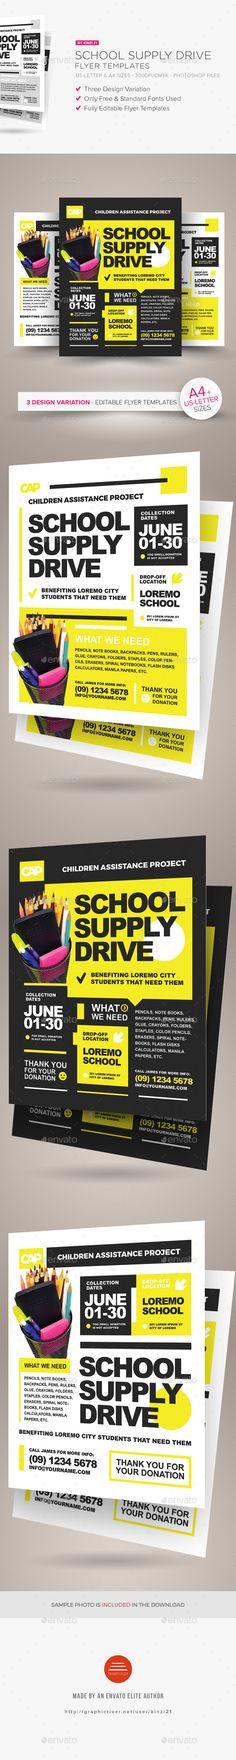 School Supply Drive Flyer Templates — Photoshop PSD #a4 #children • Download ➝ https://graphicriver.net/item/school-supply-drive-flyer-templates/19066088?ref=pxcr